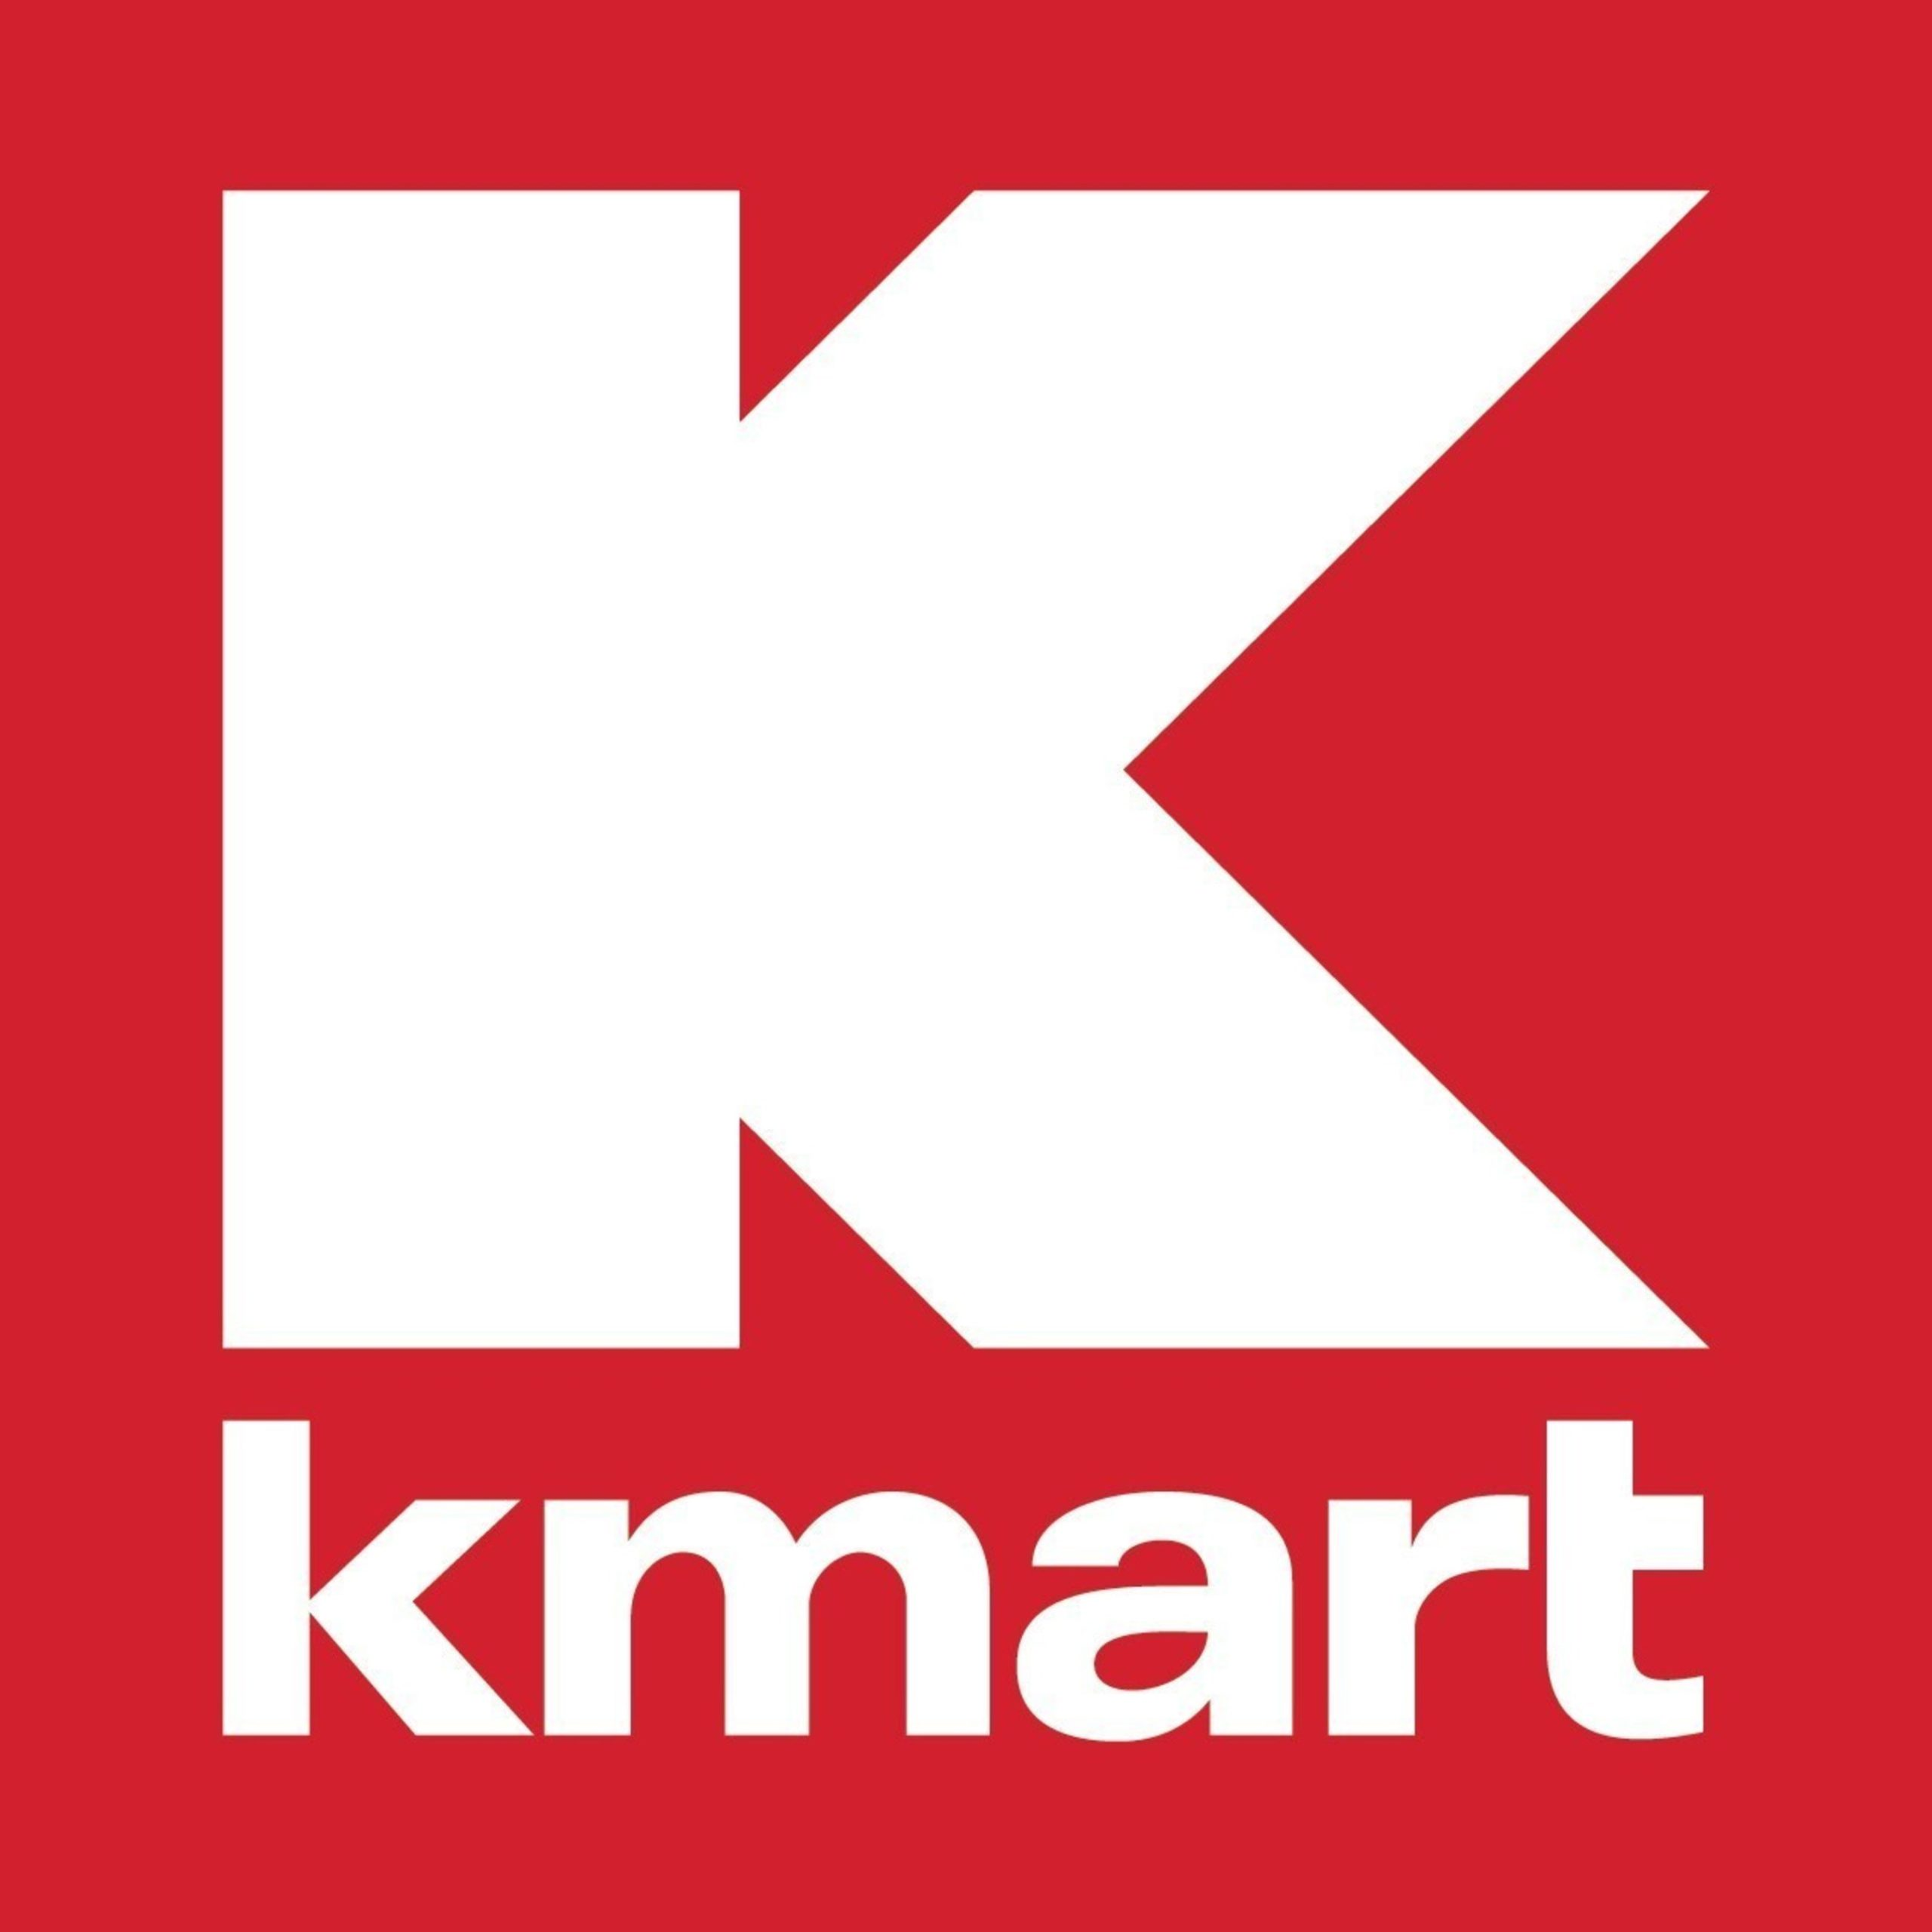 Kmart-yashl1.sg-host.com